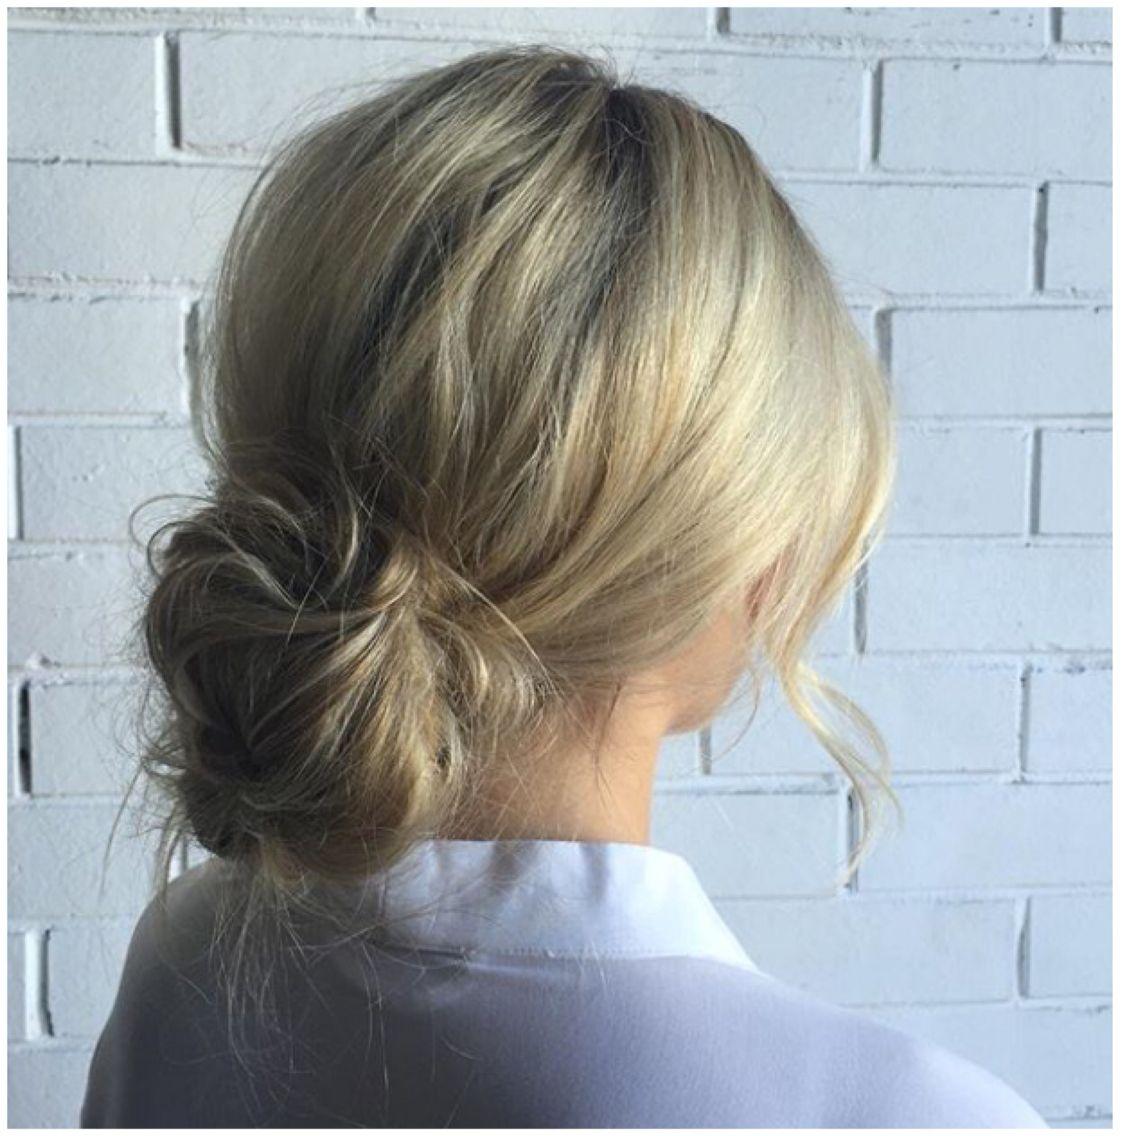 Back View Of Low Loose Bun Short Hair Bun Messy Hairstyles Easy Bun Hairstyles